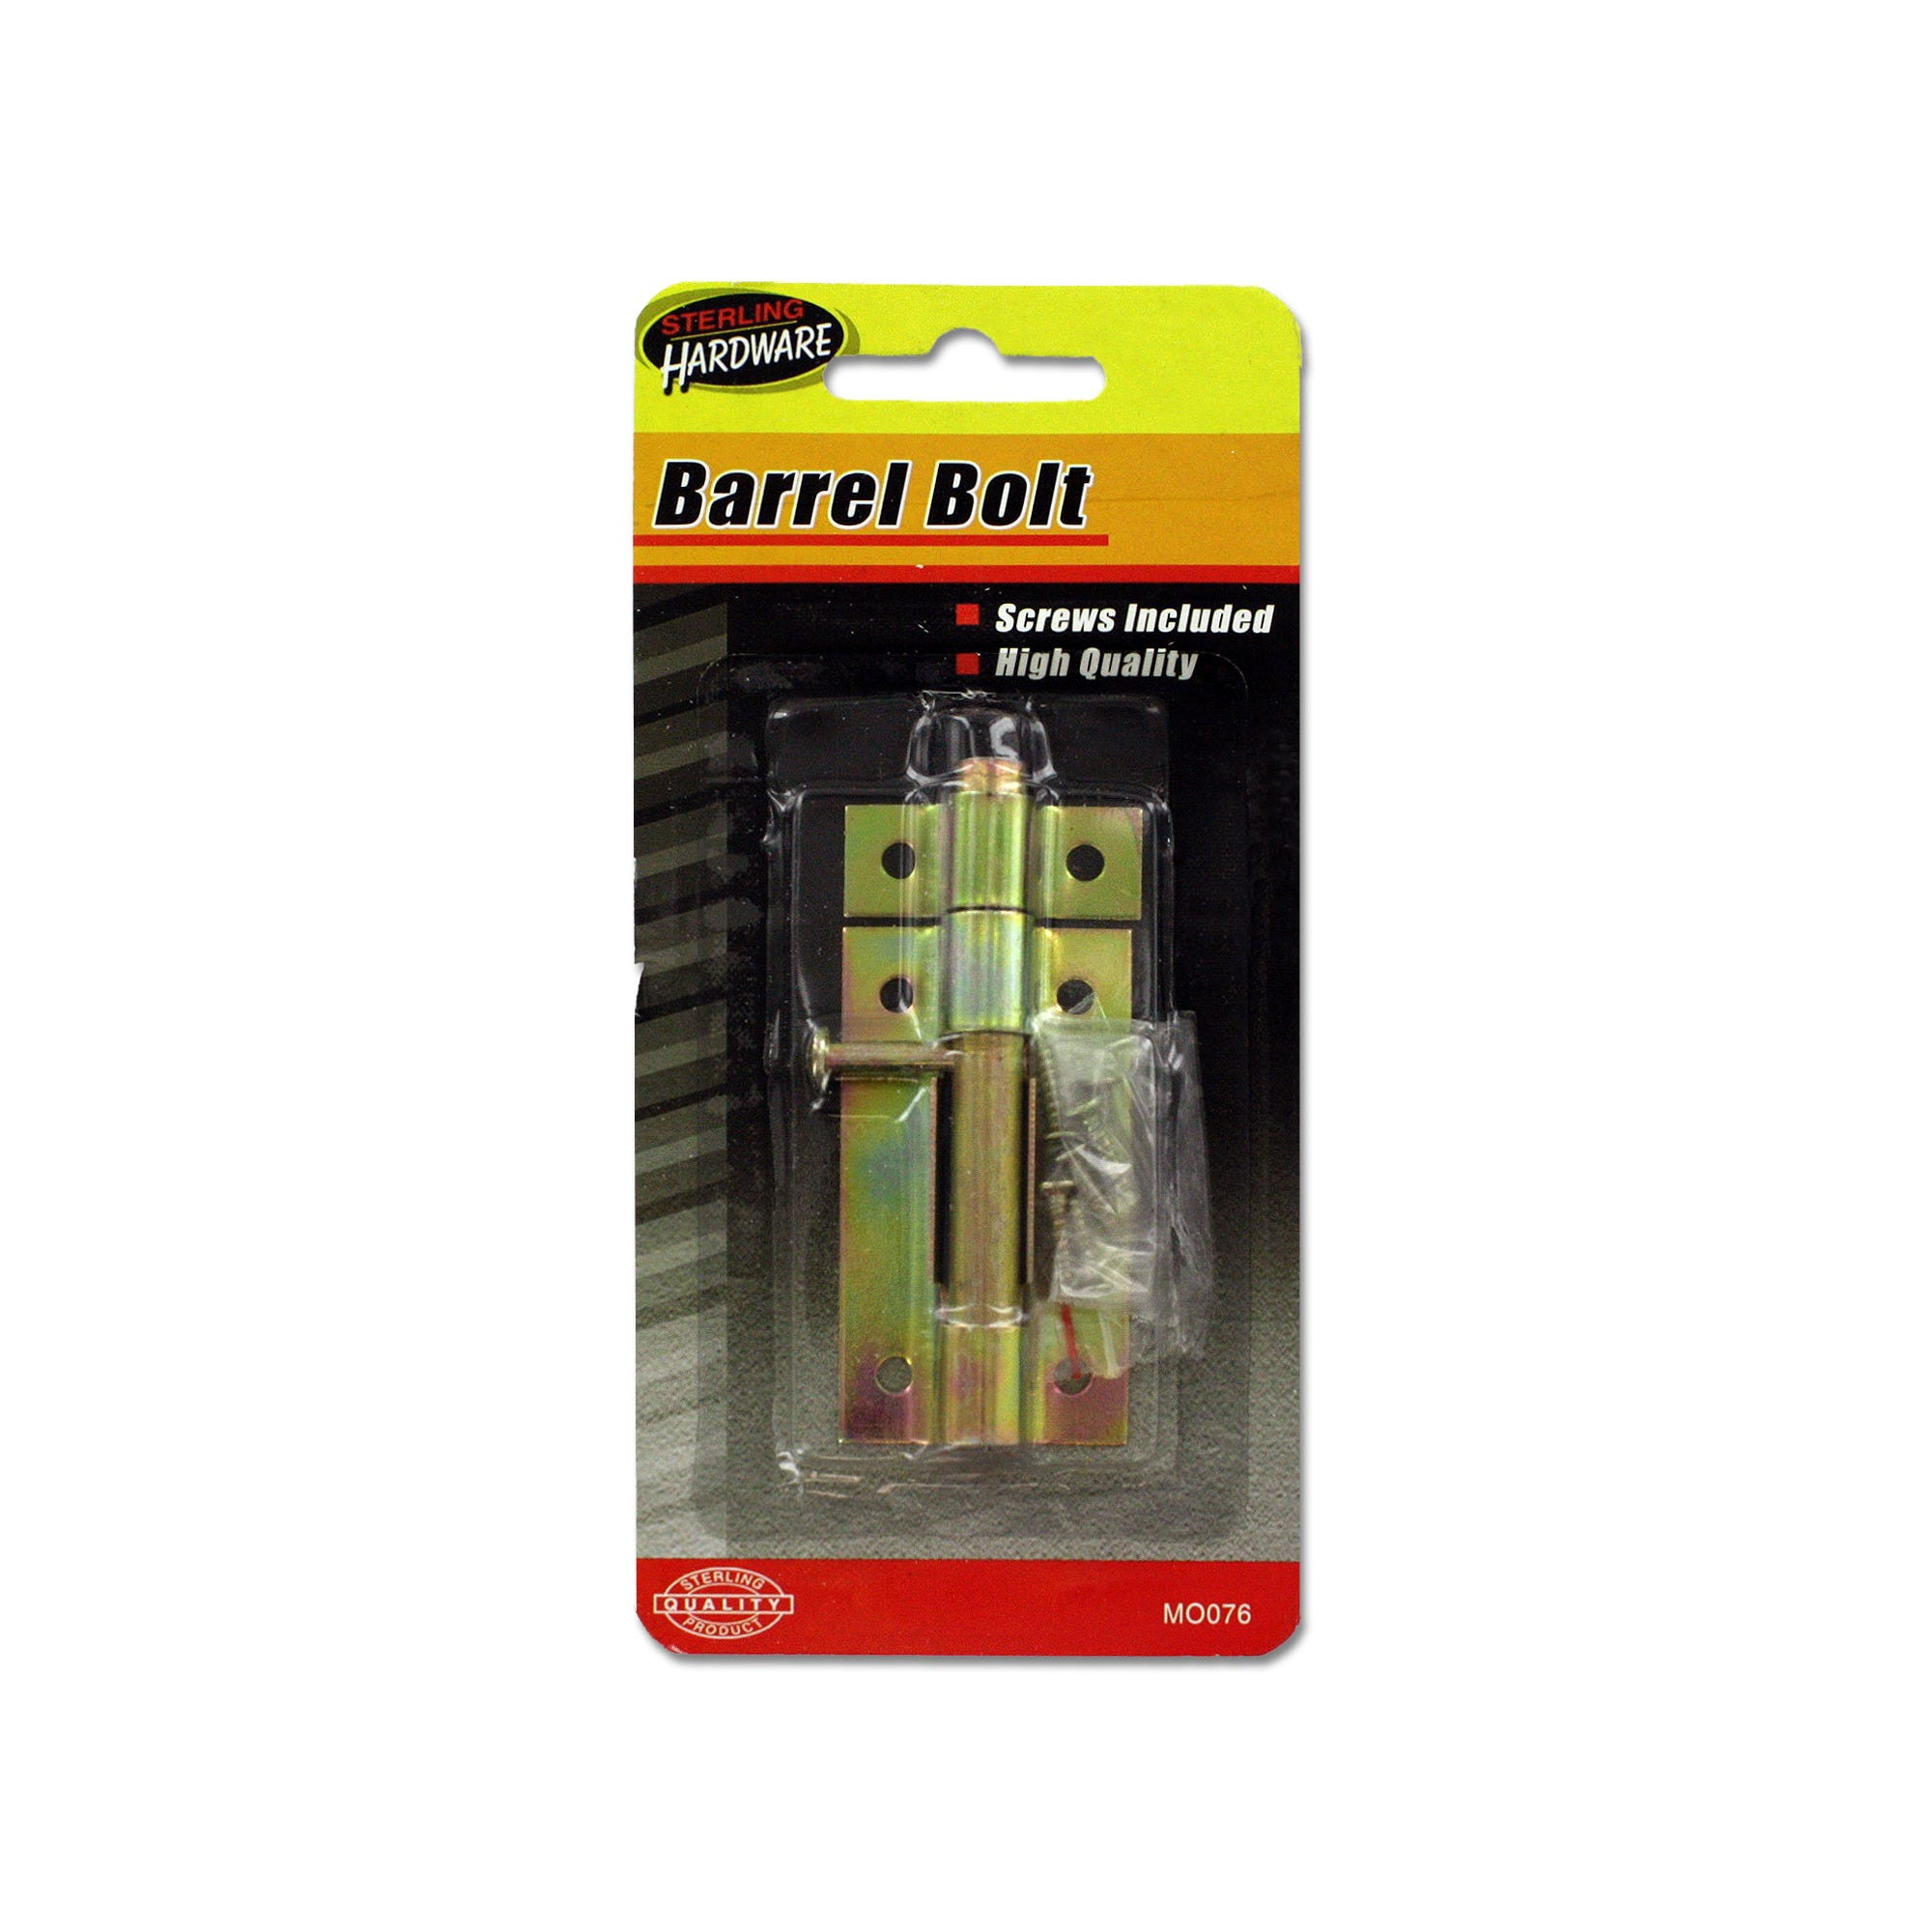 Barrel Bolt with SCREWS